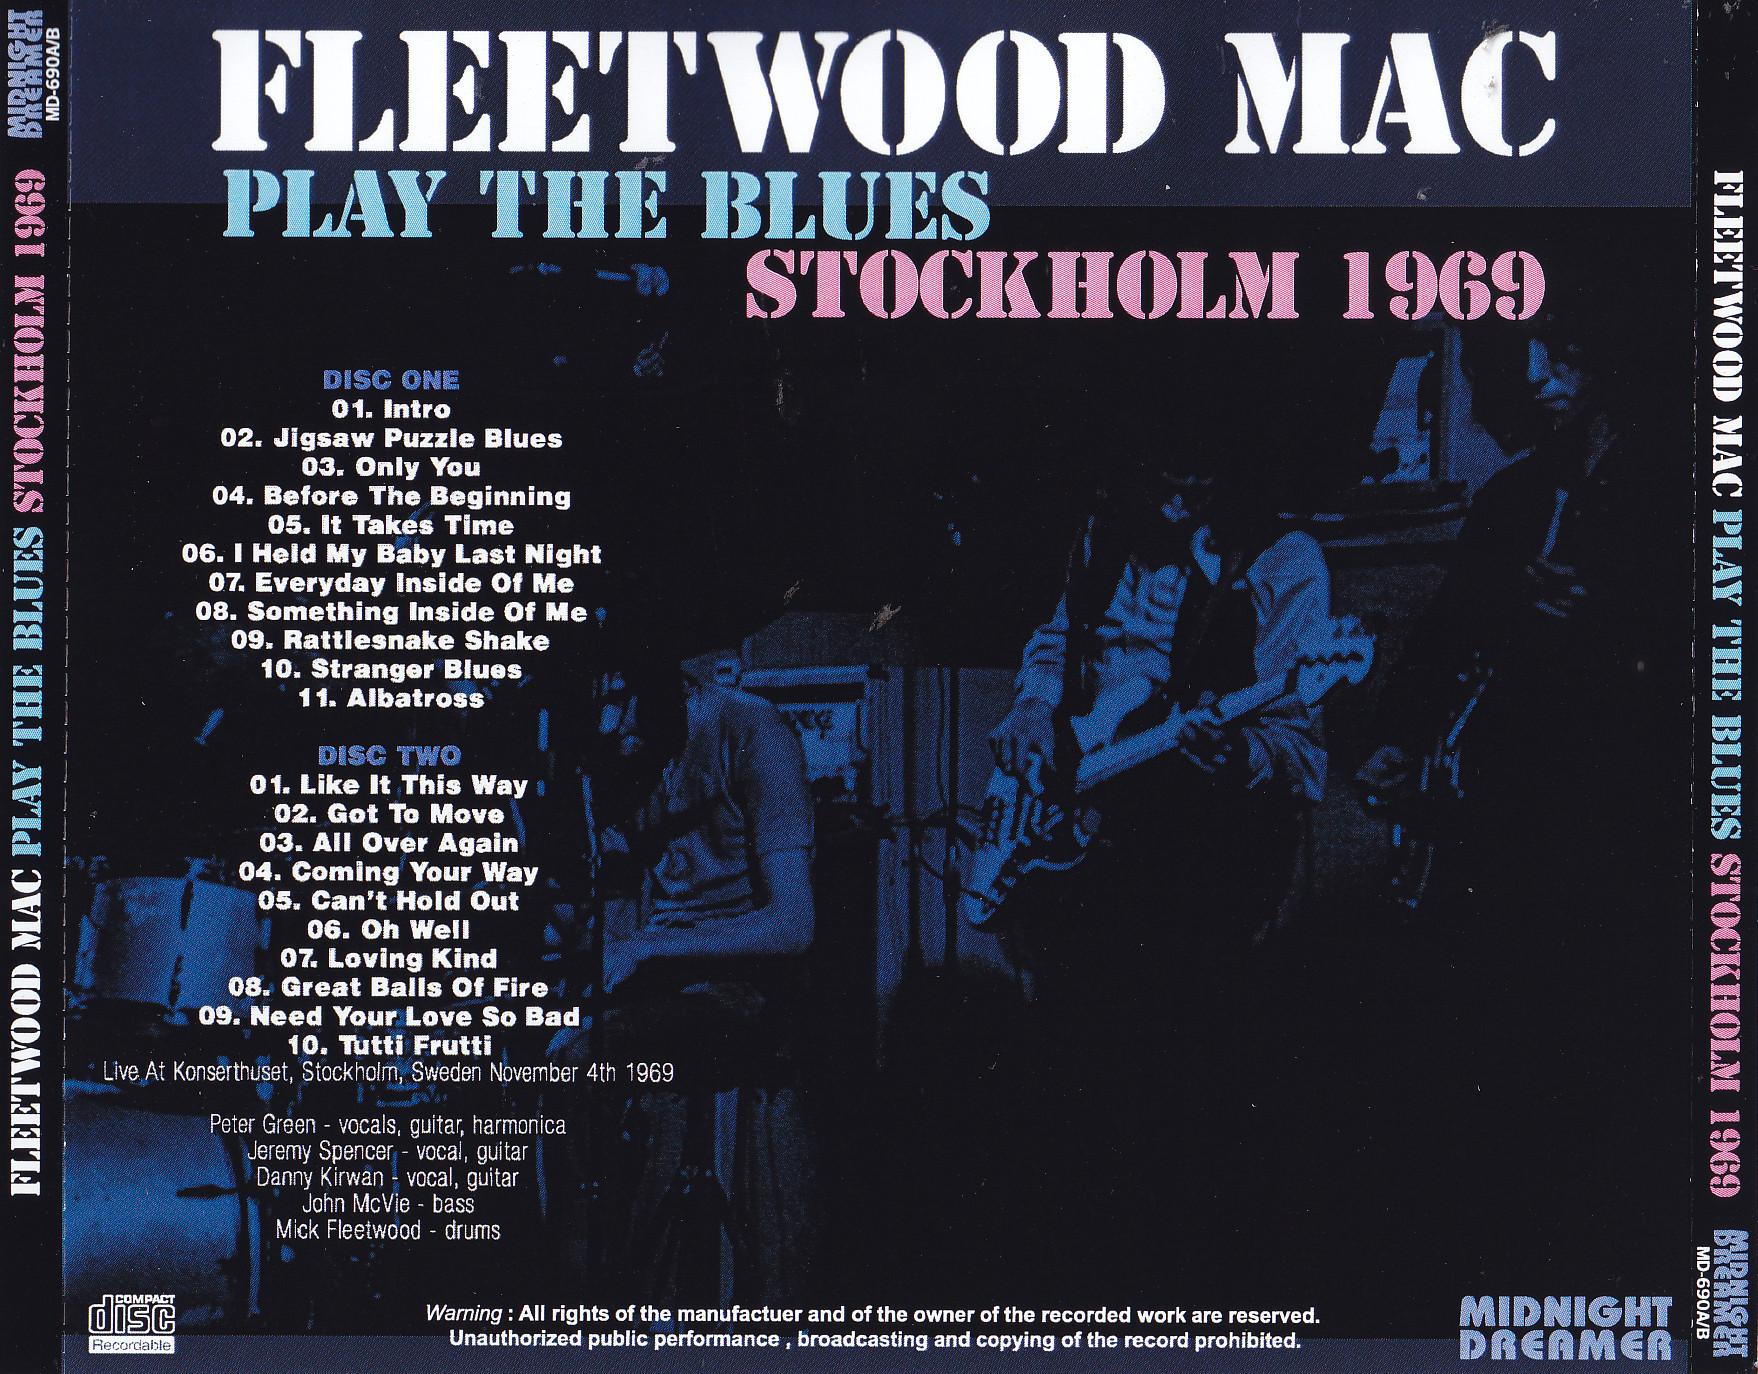 Fleetwood Mac Play The Blues Stockholm 1969 2cdr